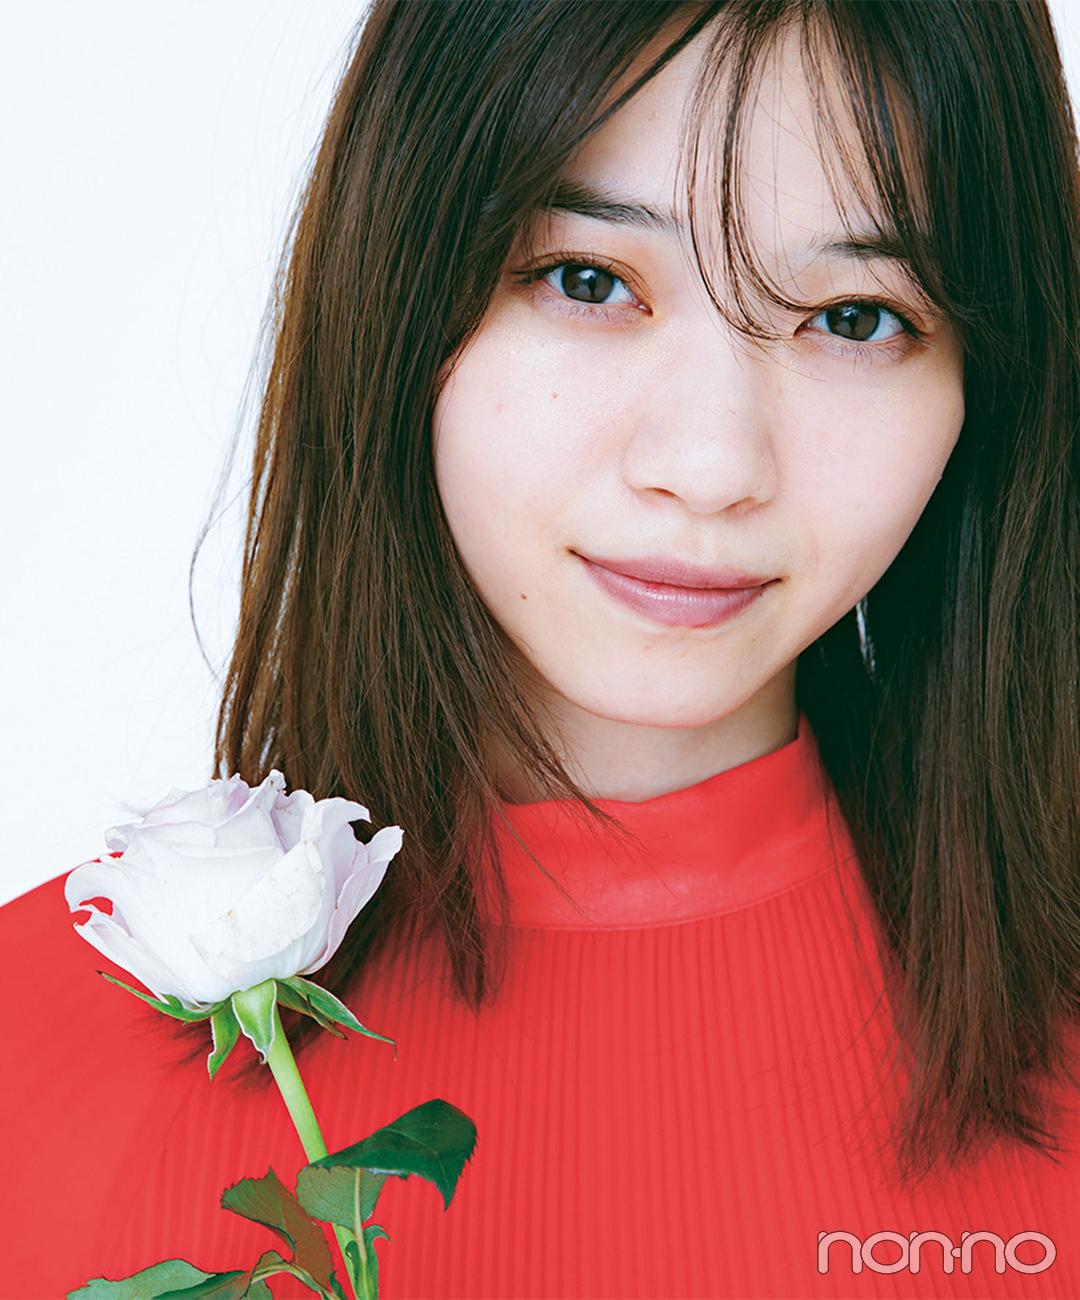 Photo Gallery|モデル・西野七瀬の最新フォトギャラリーを見る_1_2